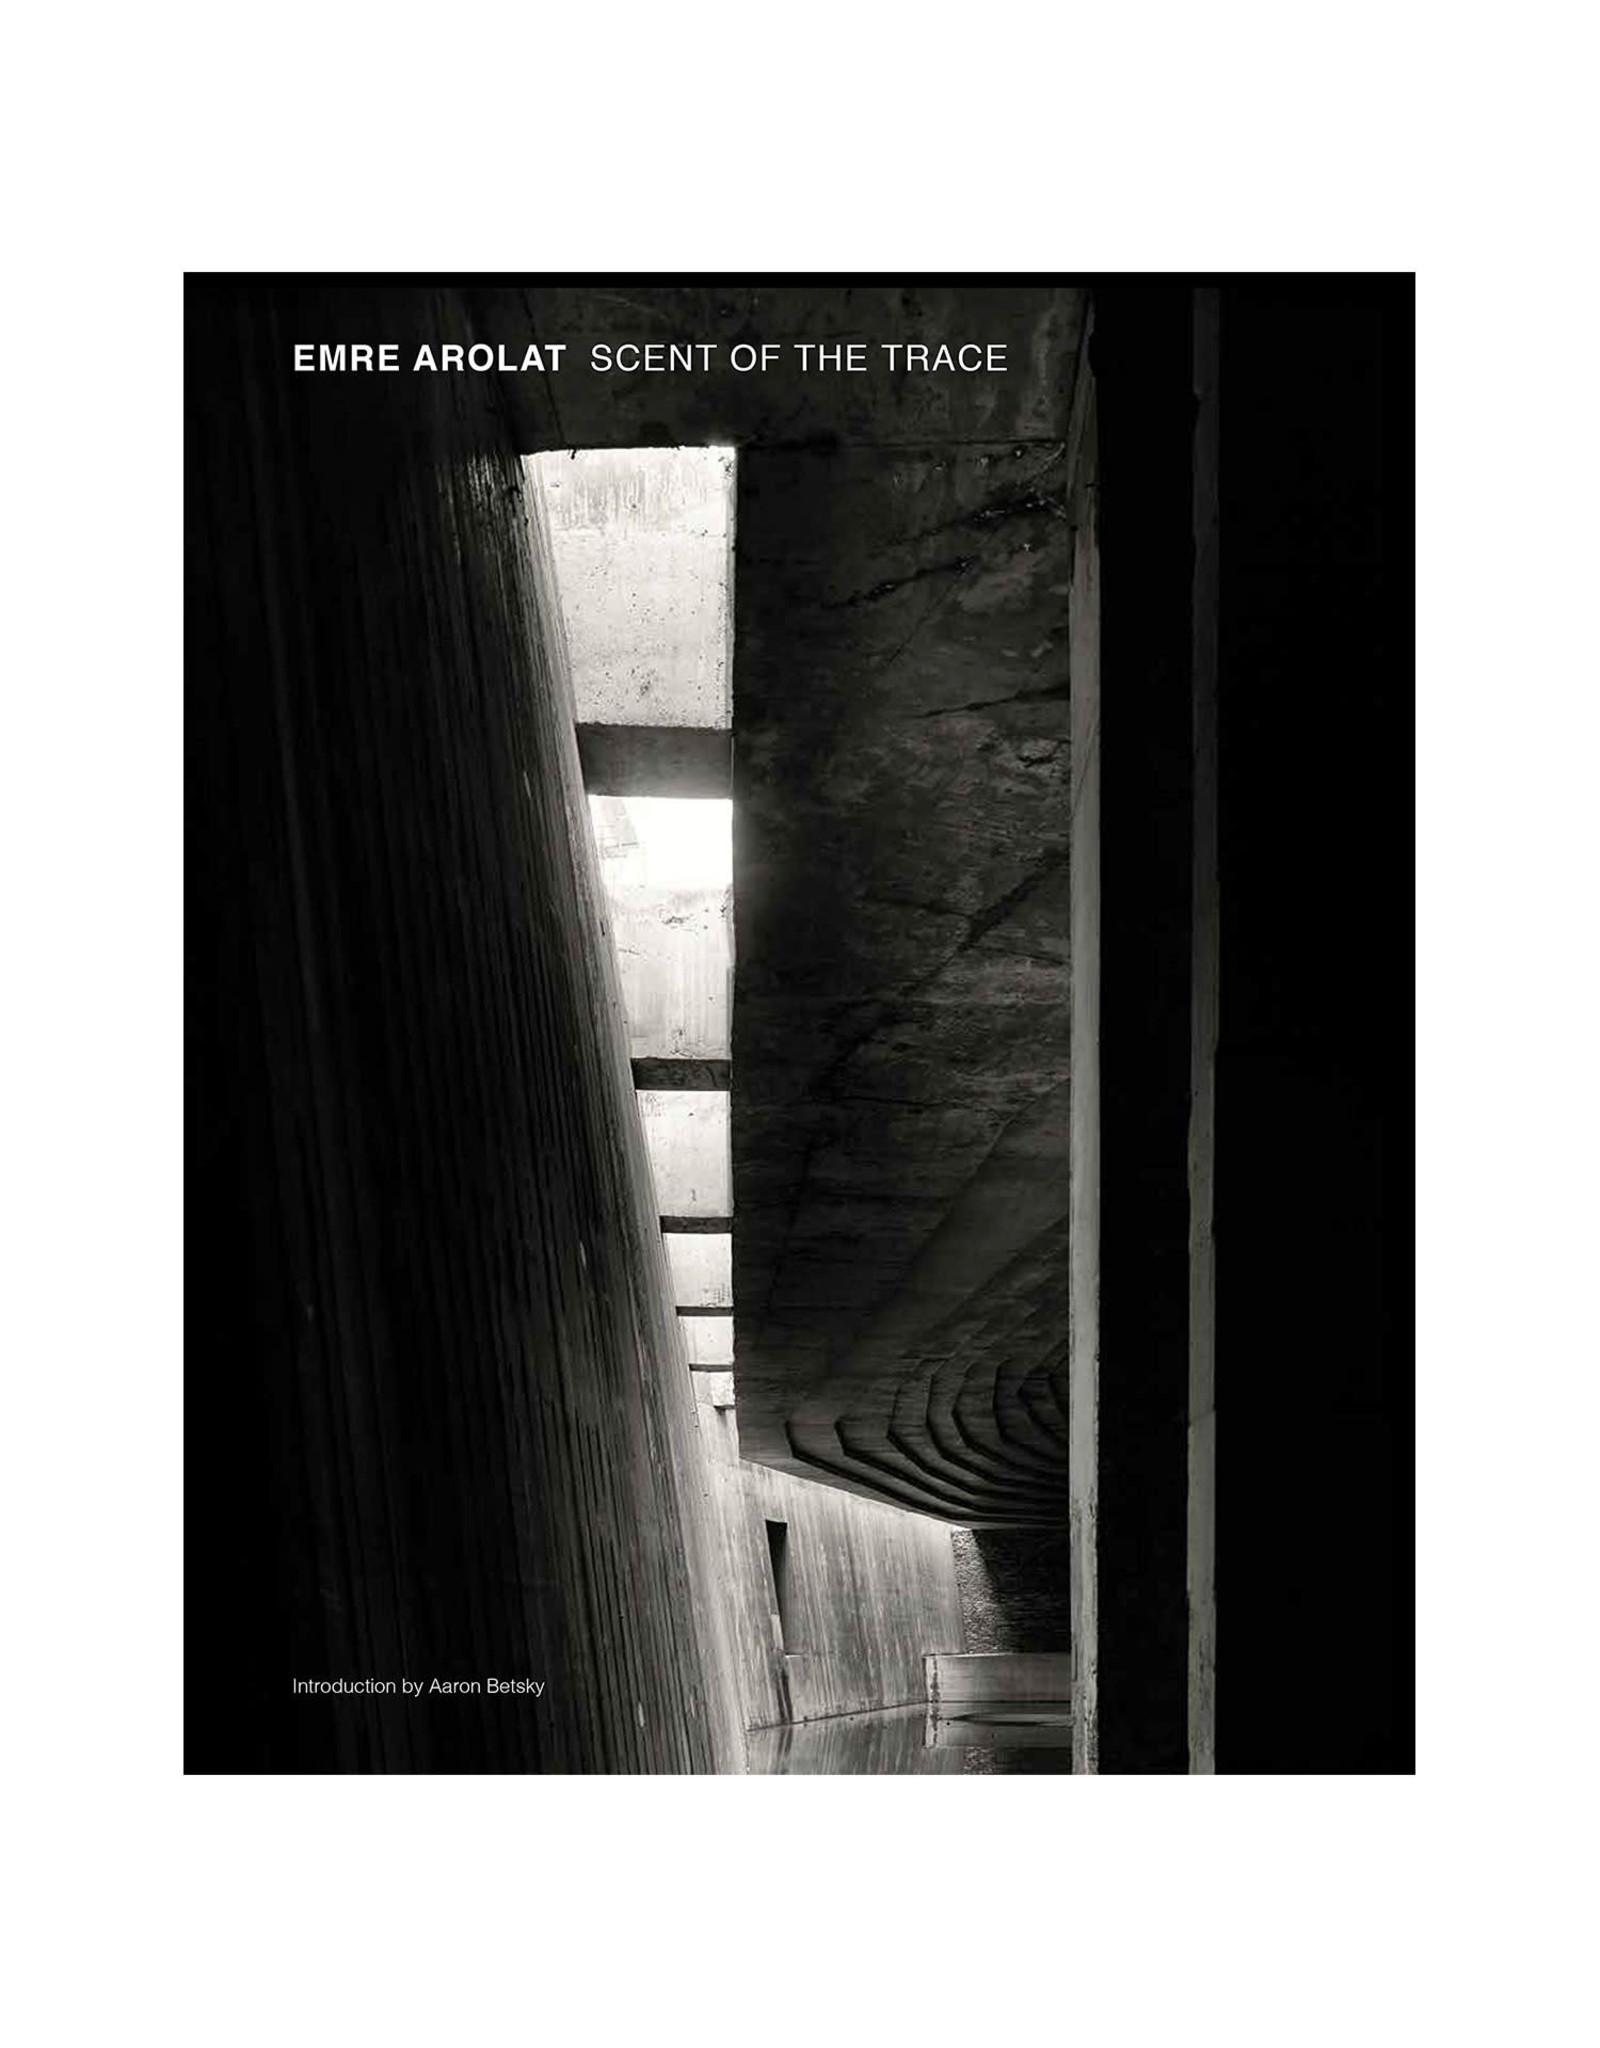 Emre Arolat, Scent of the Trace